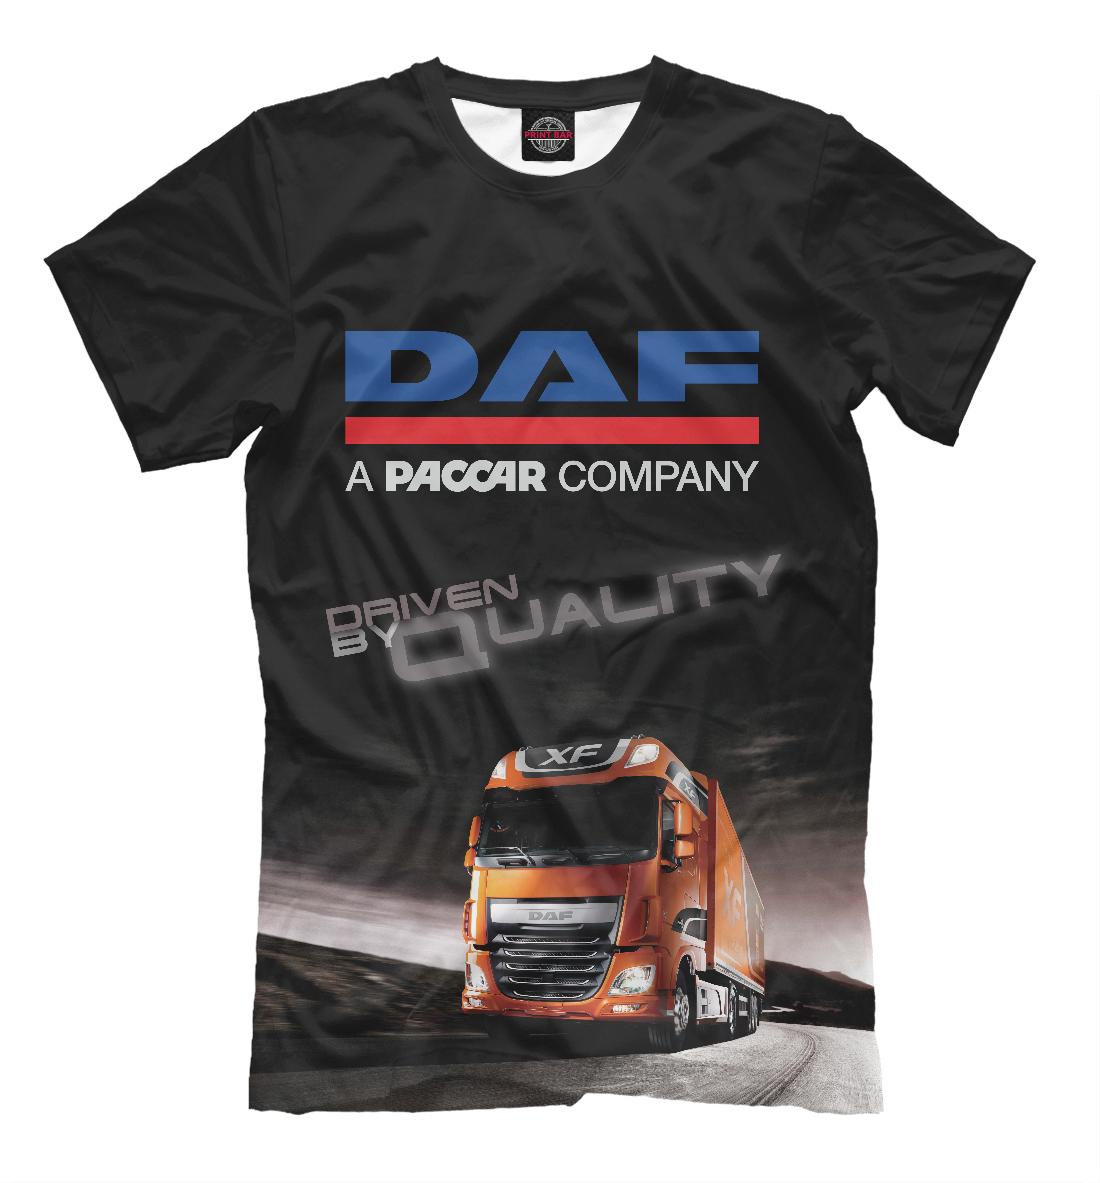 Купить DAF - Driven By Quality, Printbar, Футболки, GRZ-912734-fut-2